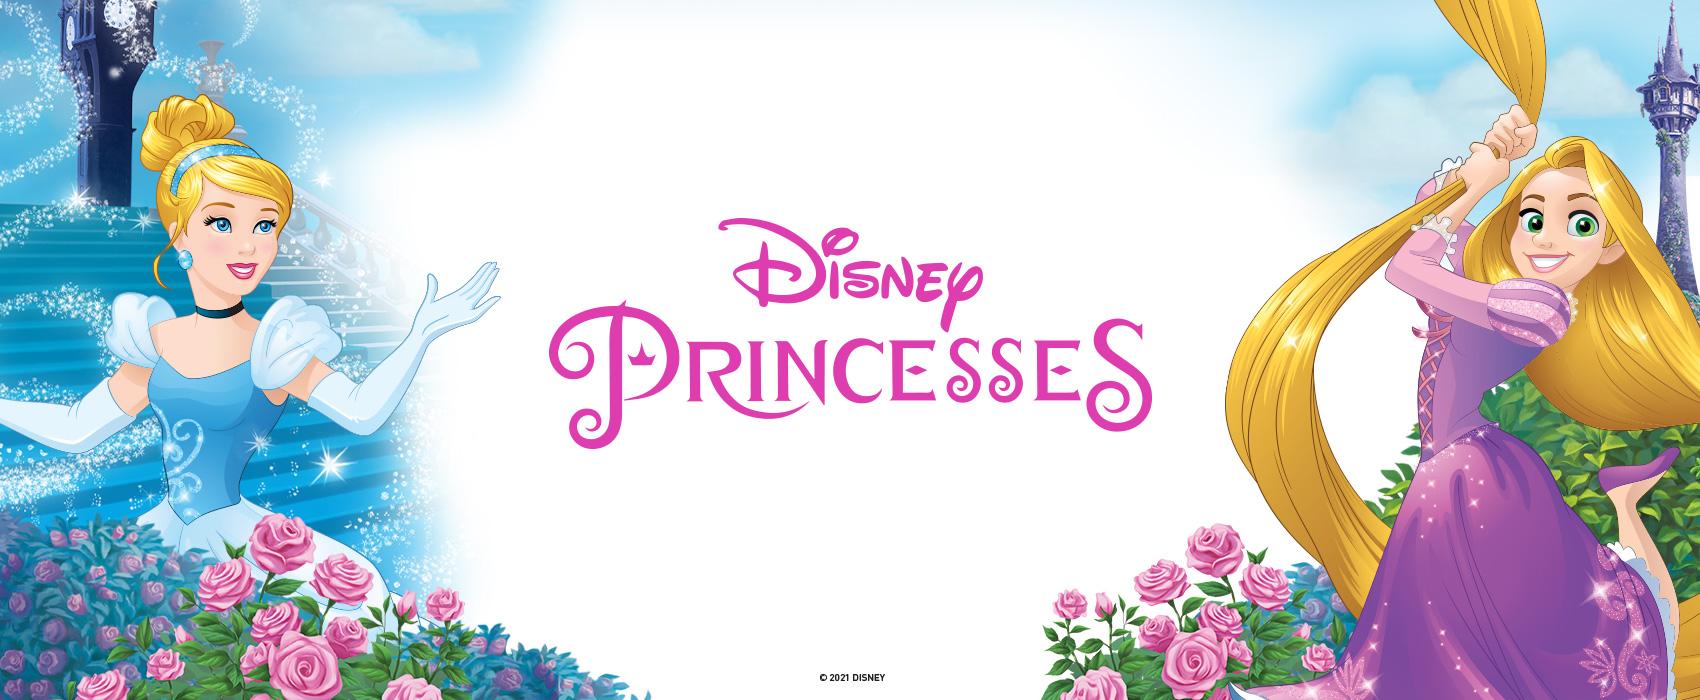 CG2021_Marques_1700x700_DisneyPrincesses